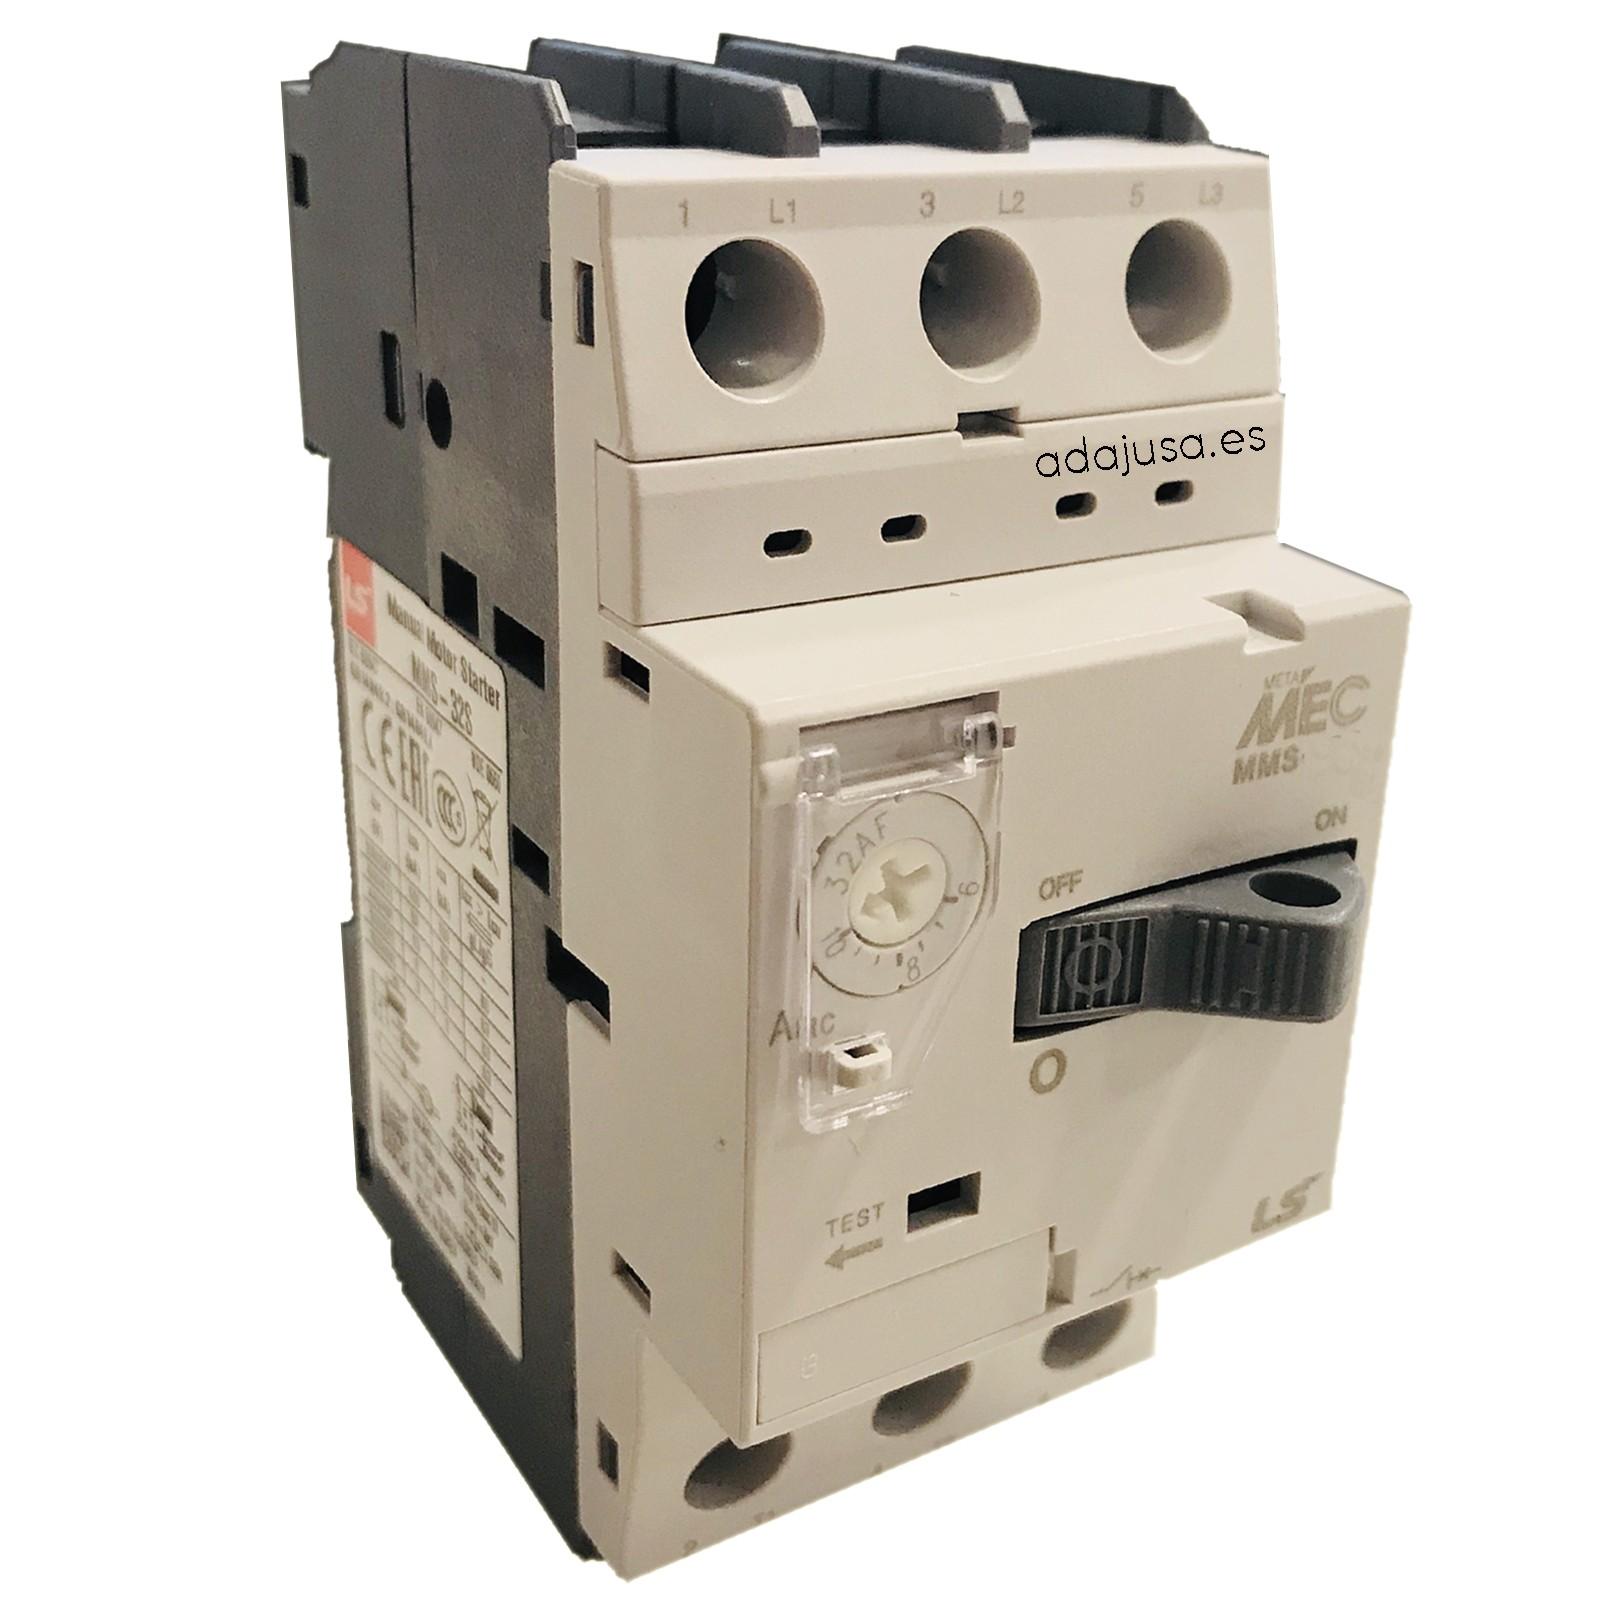 Interruttore salvamotore da 4 a 6 A MMS-32S - LSis